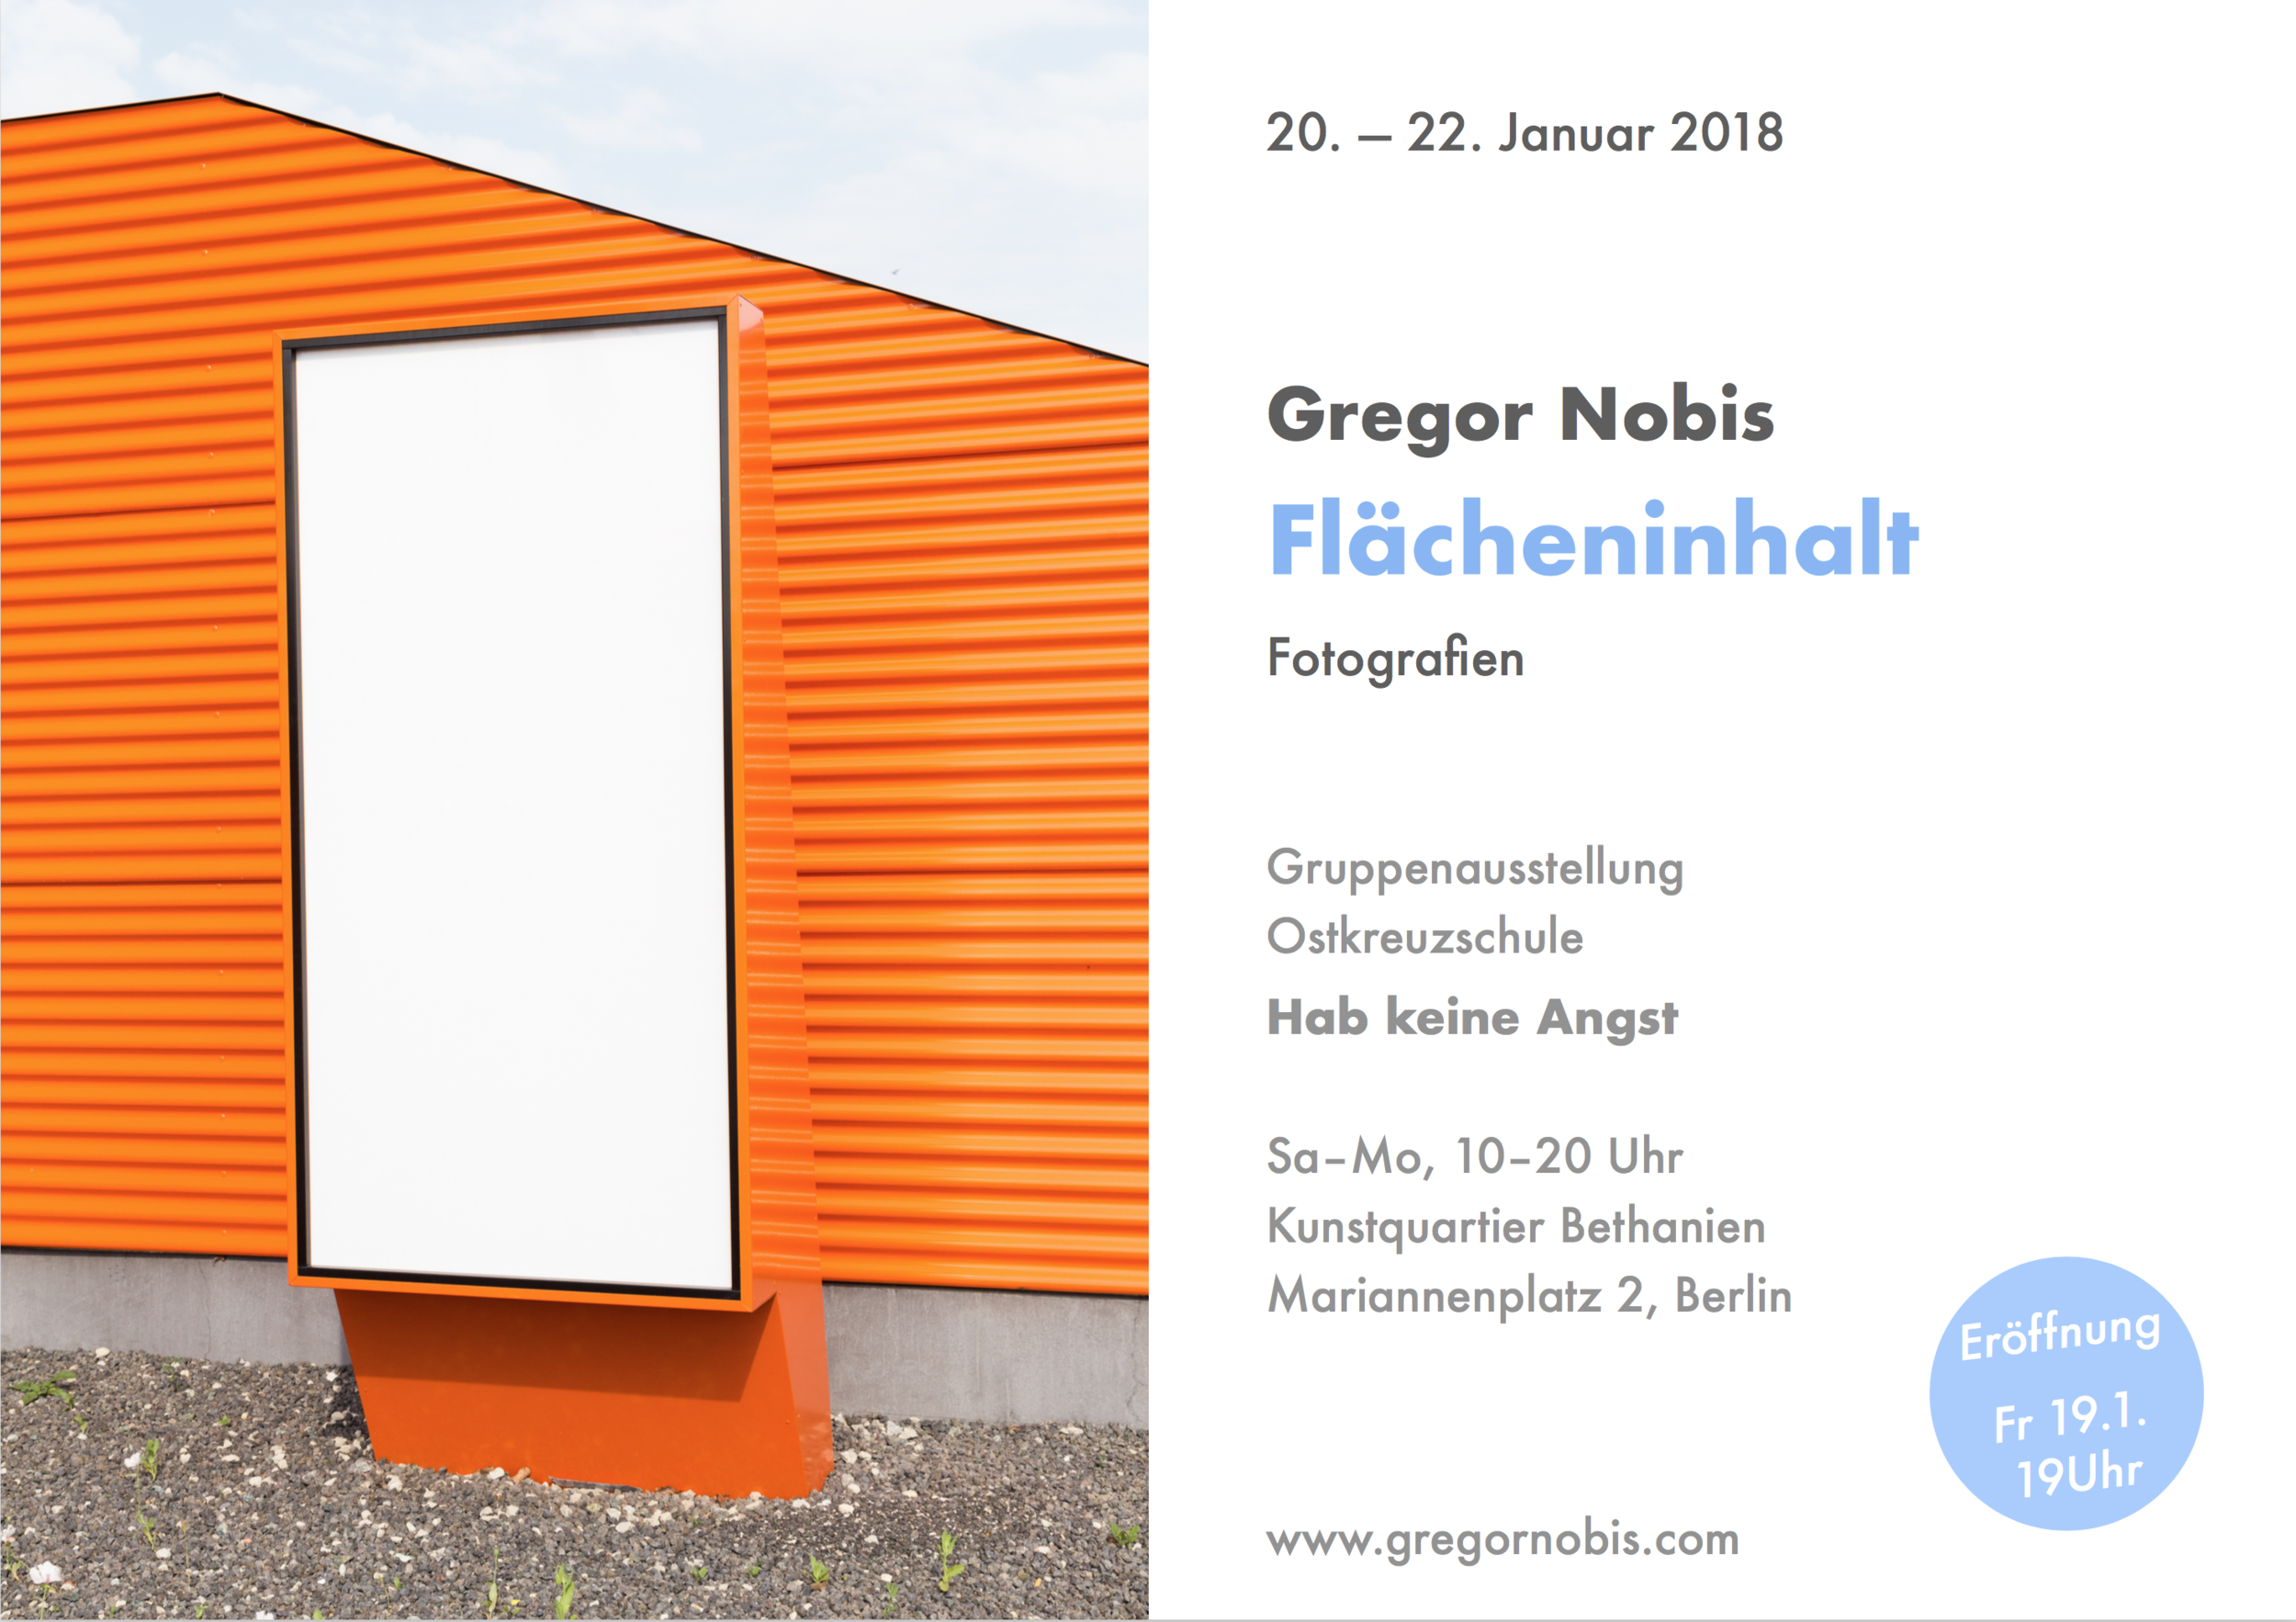 gregor-nobis-flaecheninhalt-show3